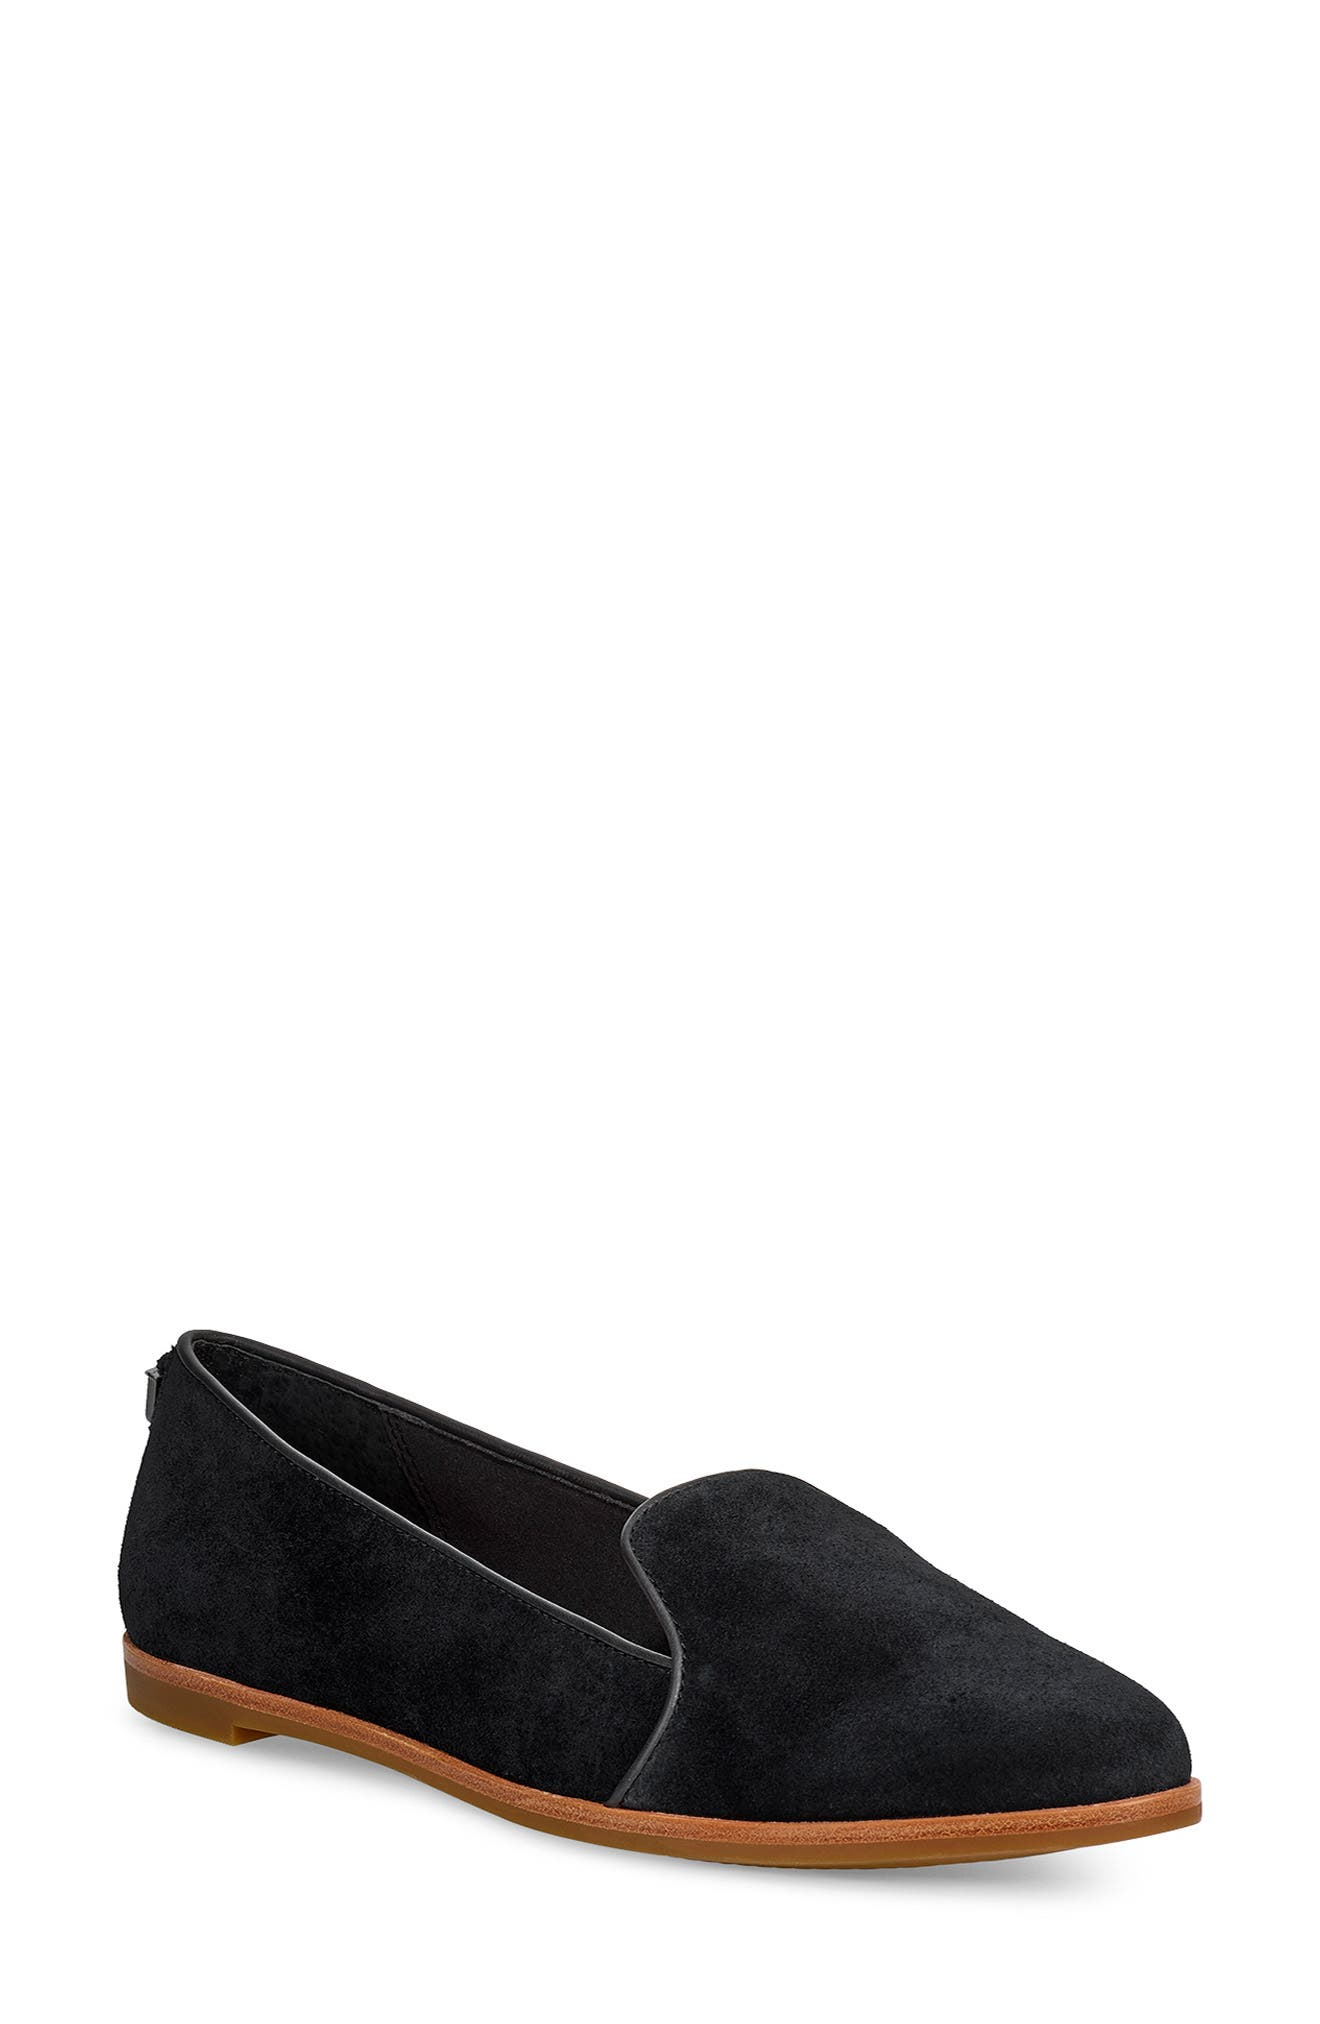 Bonnie Loafer Flat, Main, color, BLACK SUEDE